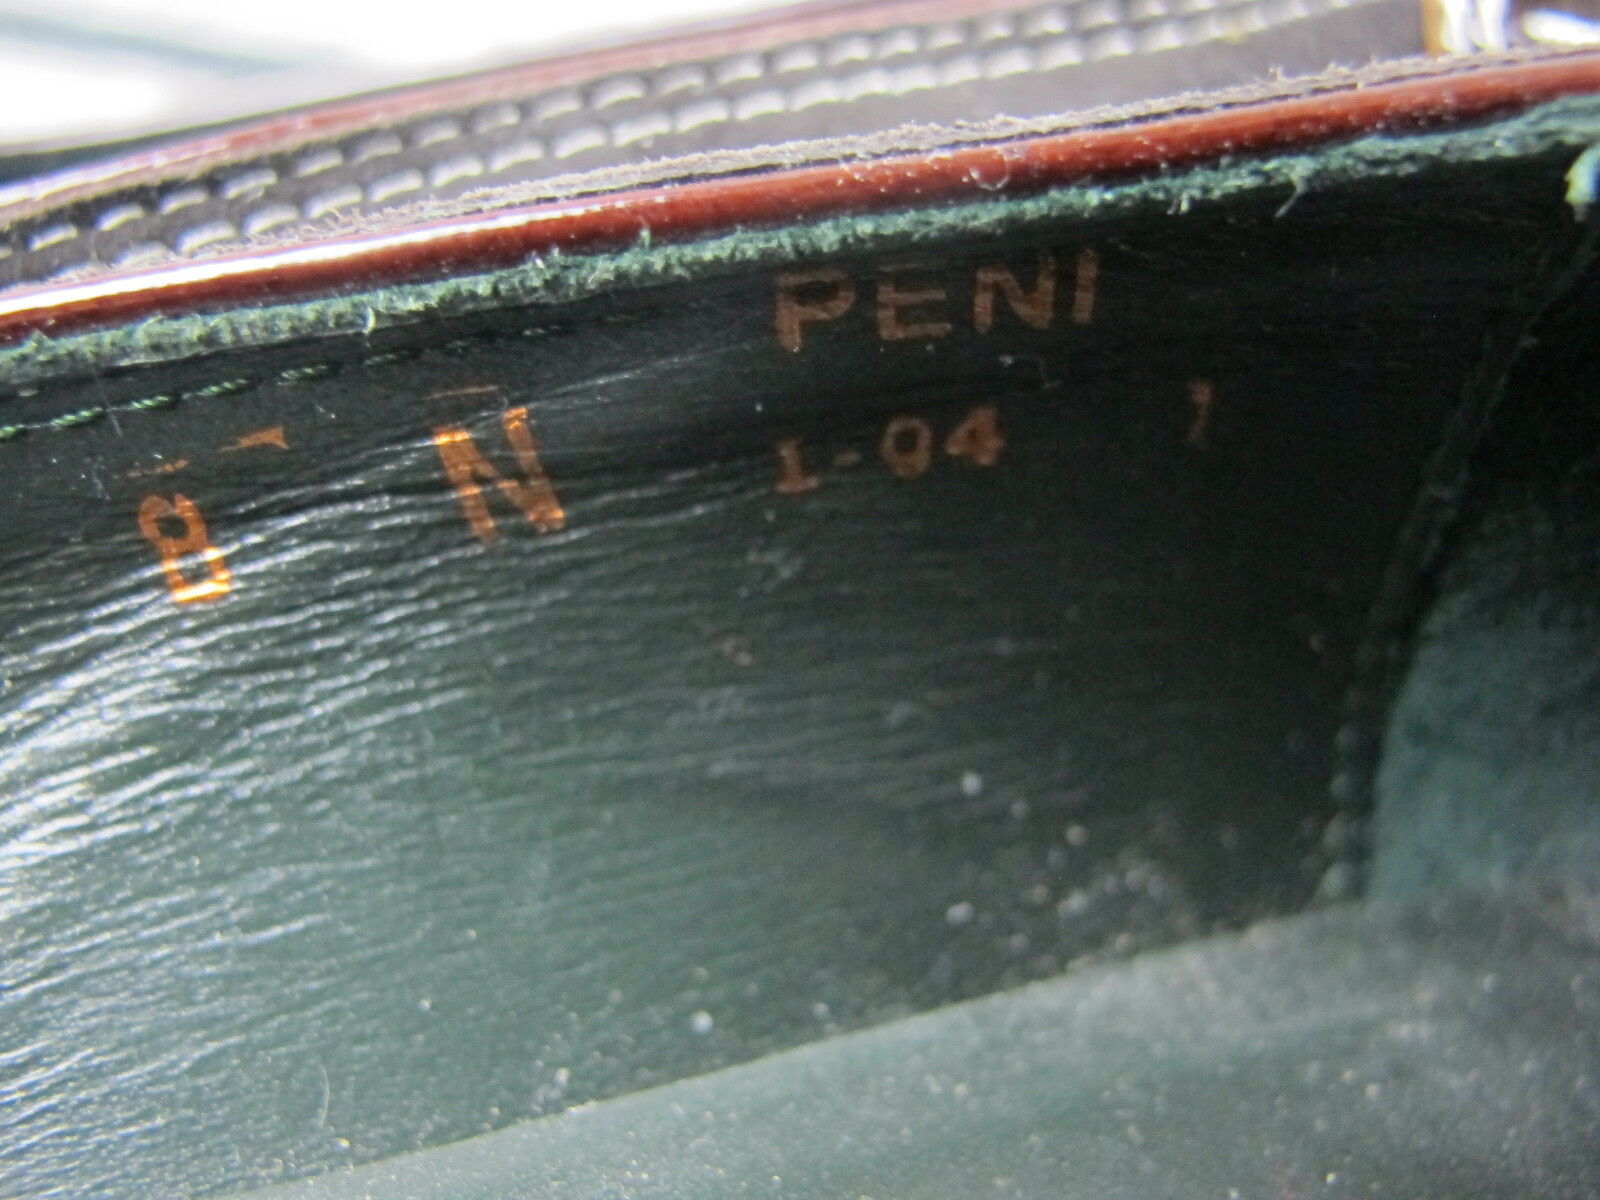 Donald J Pliner    PENI Chocolate braun Slip on Nubuck Trim Wedge Loafer 8M 3bdf1c